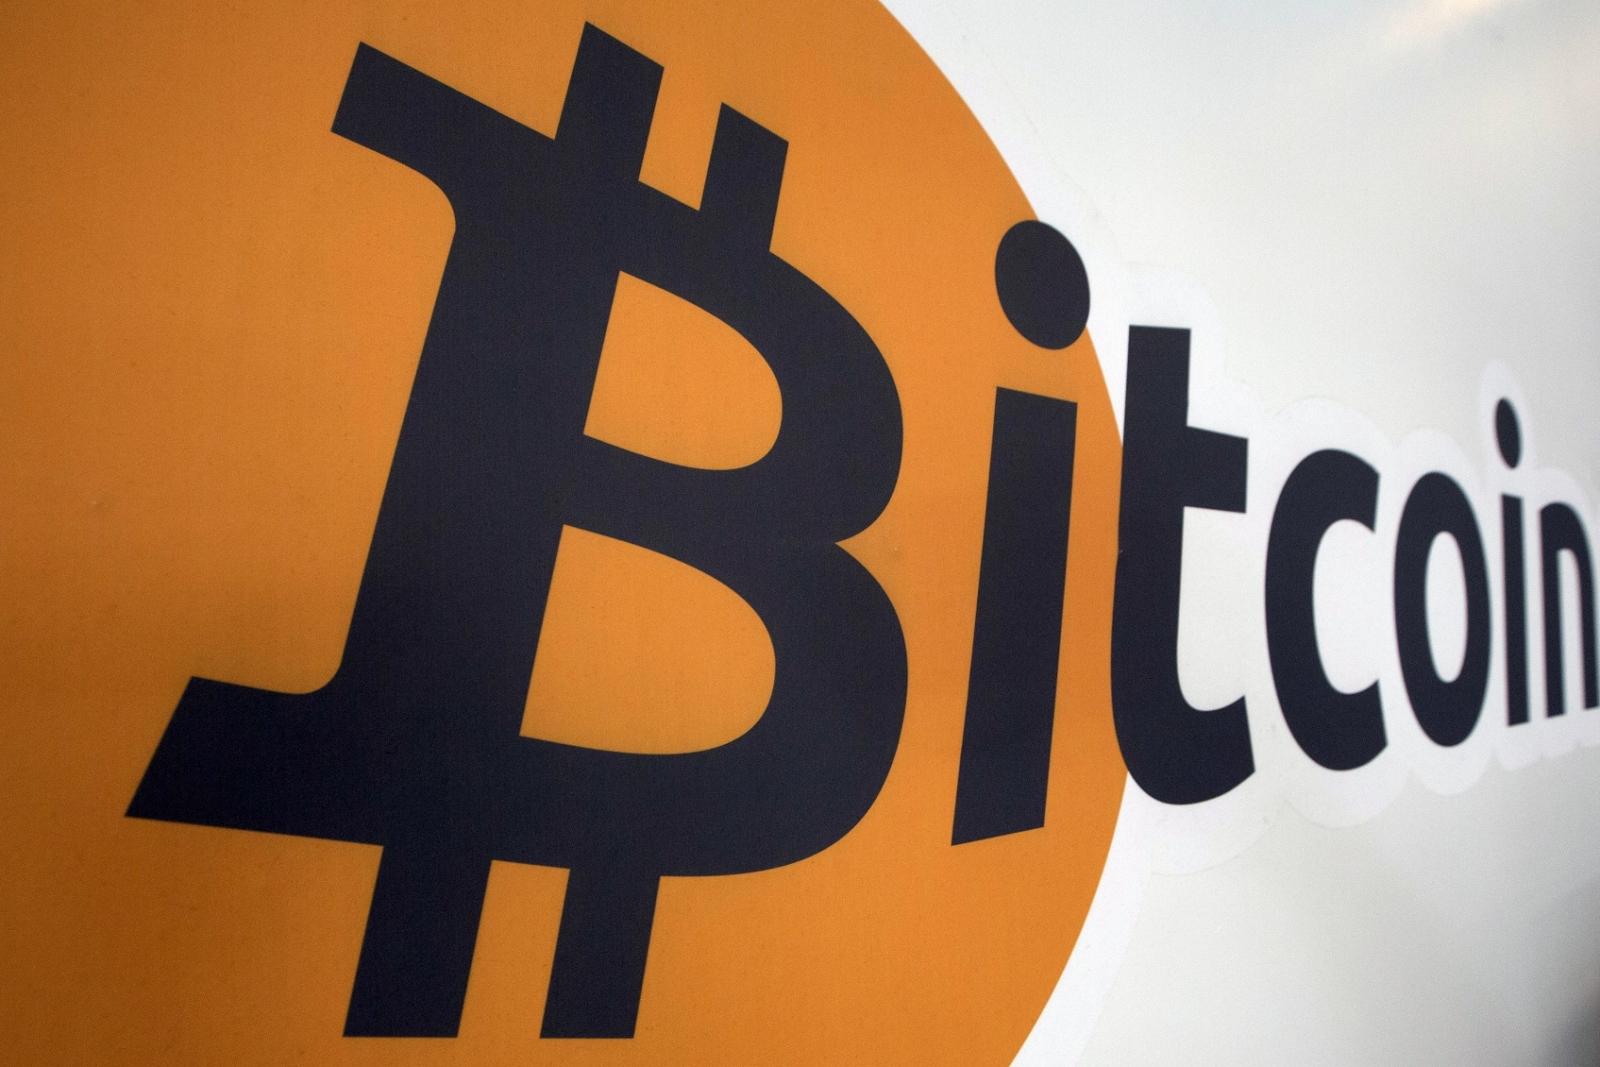 bitcoin exchange iran BTXCapital draglet